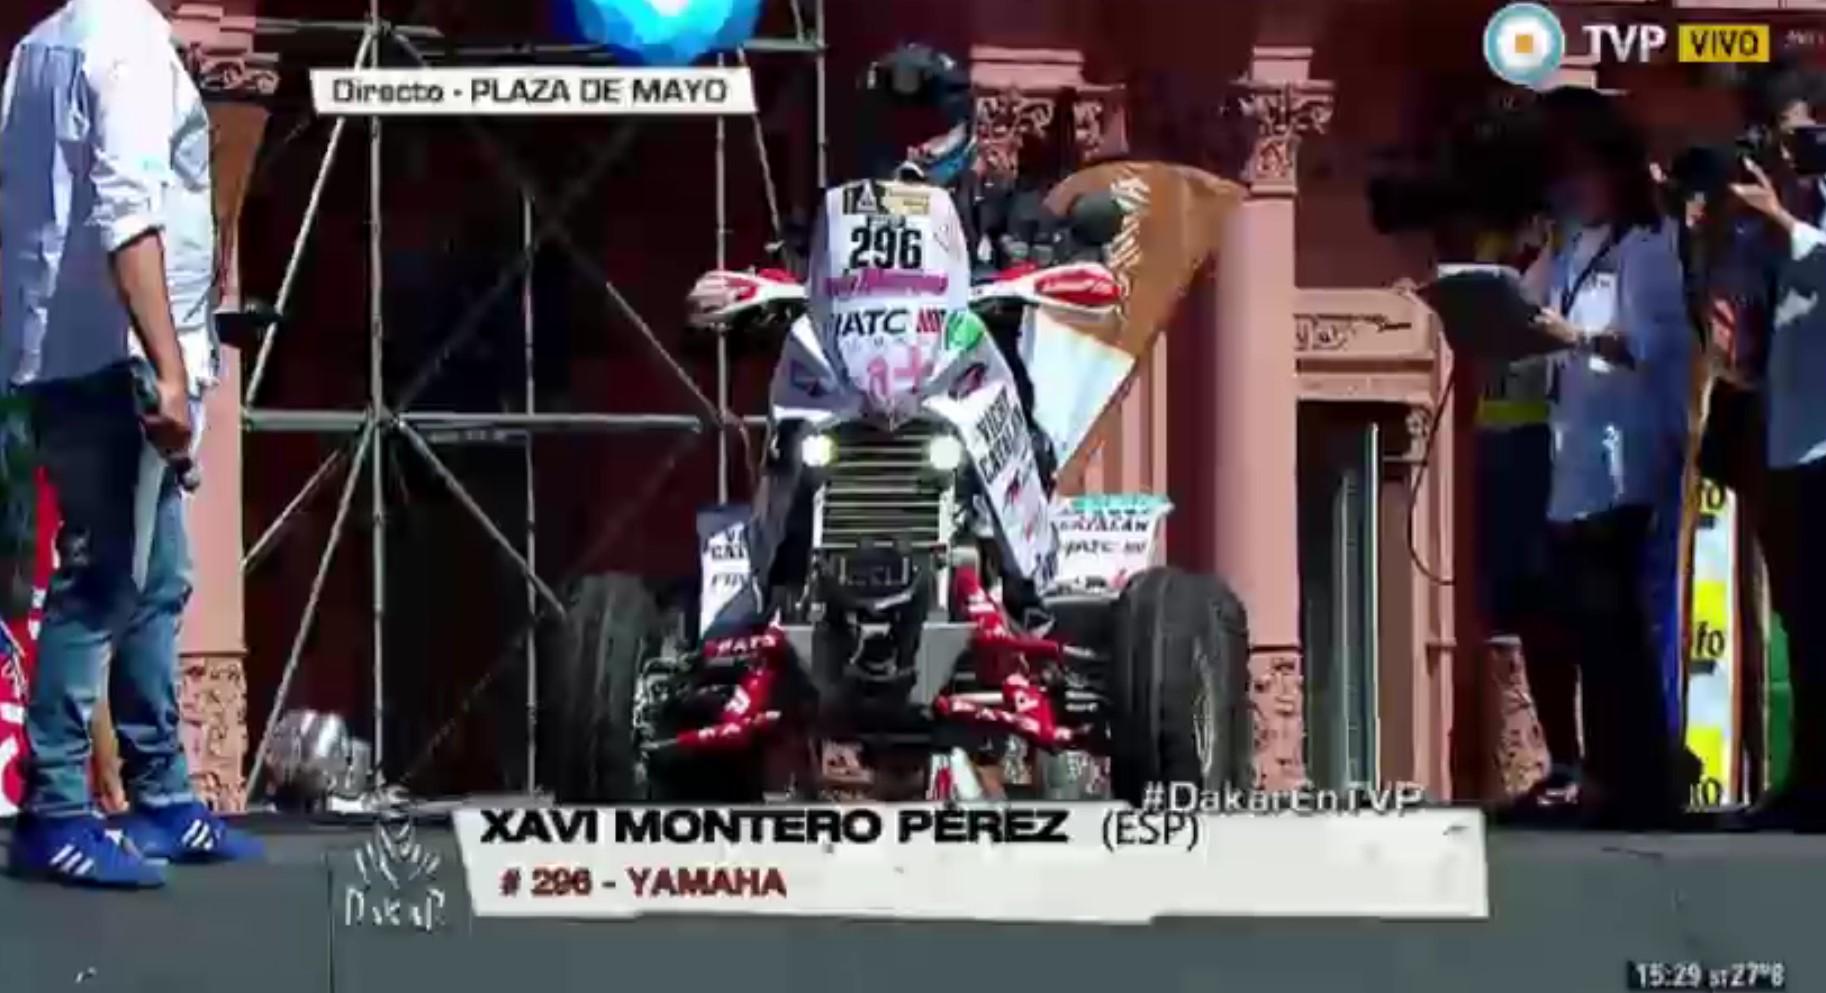 2015 Rallye Raid Dakar Argentina - Bolivia - Chile [4-17 Enero] - Página 5 B6cg6IqIMAER0Hy